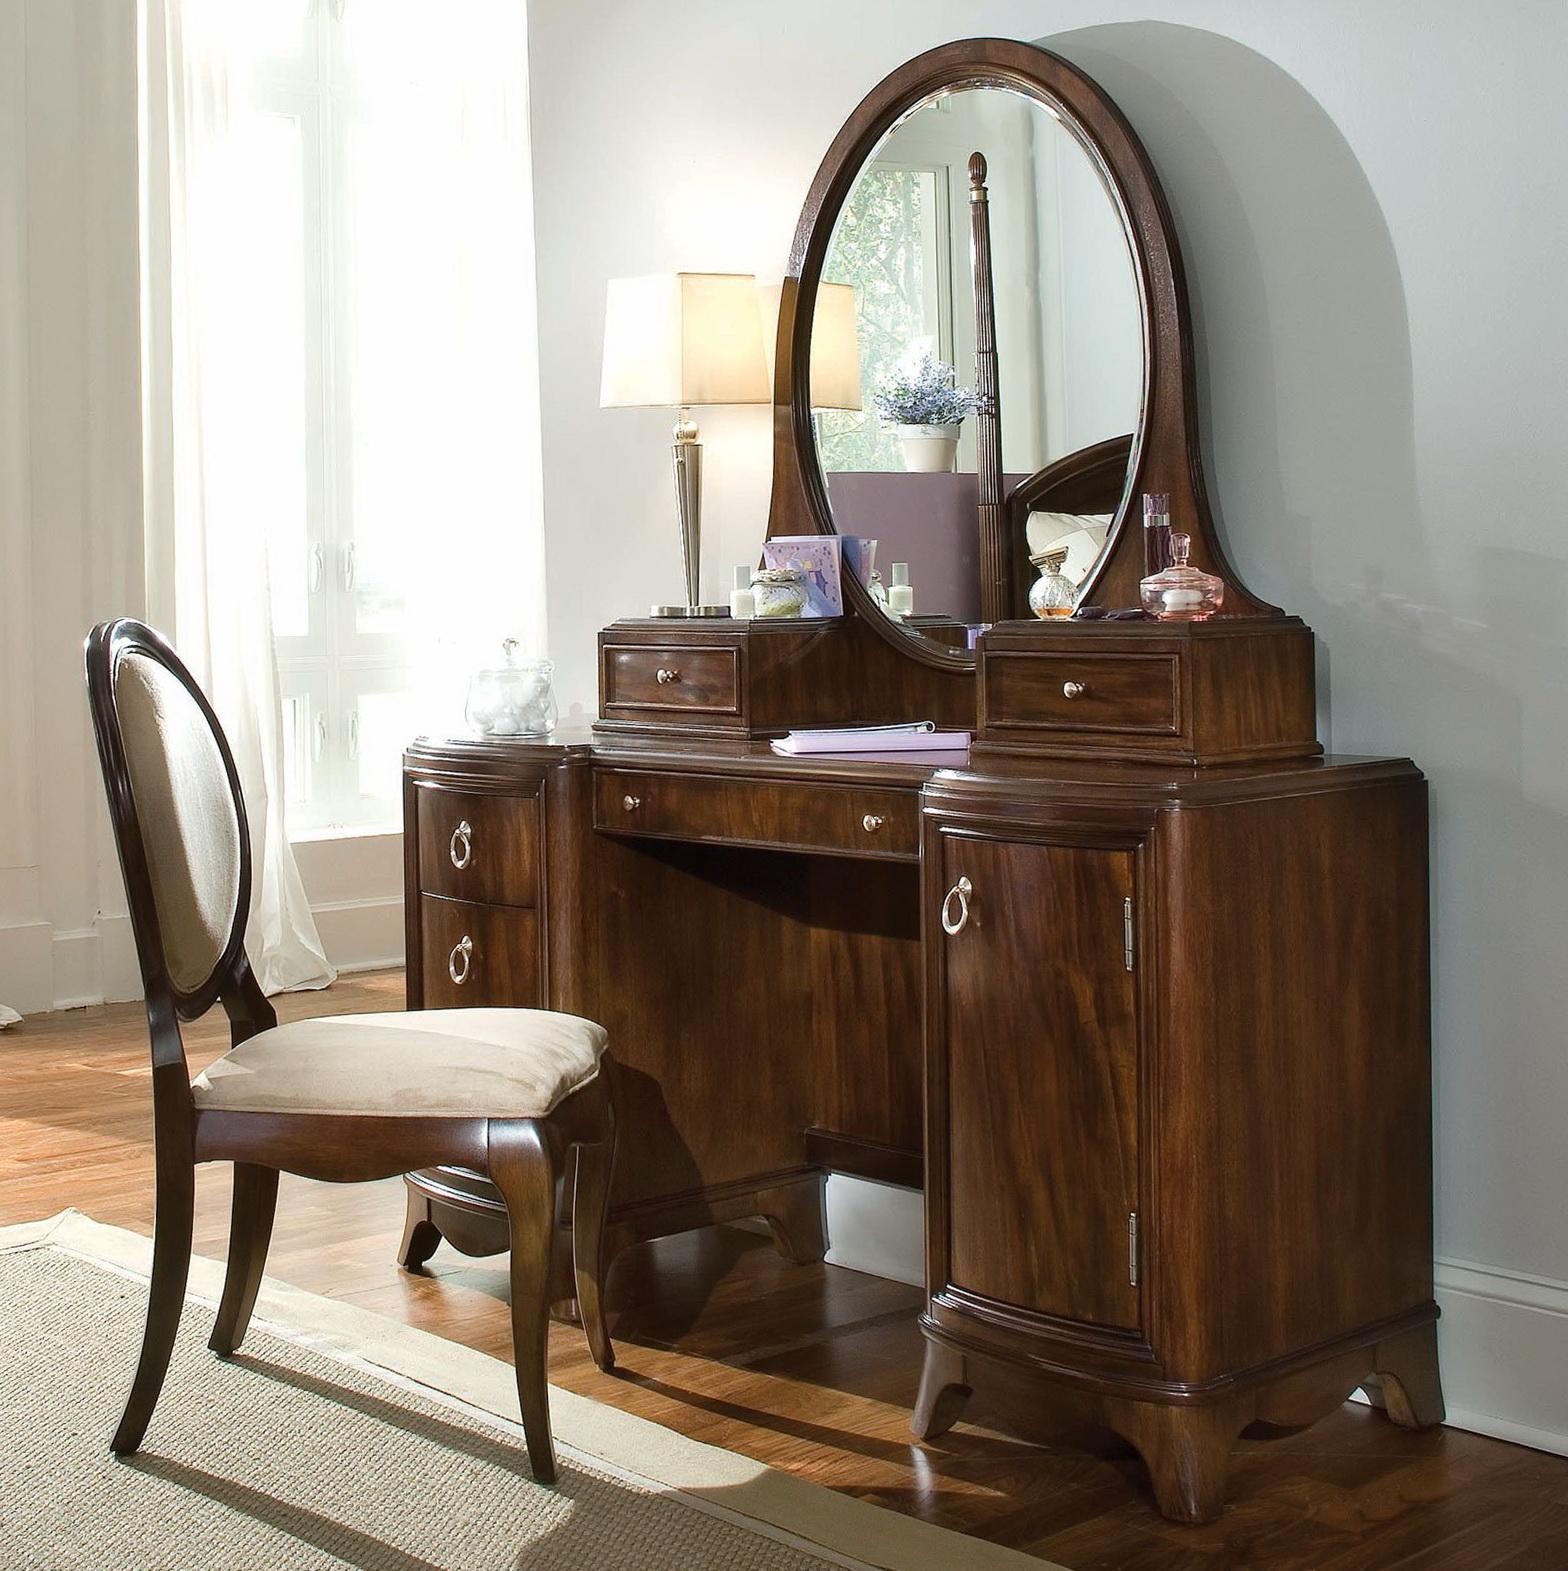 oak makeup vanity set. Dark Wood Bedroom Vanity Set  Home Design Ideas